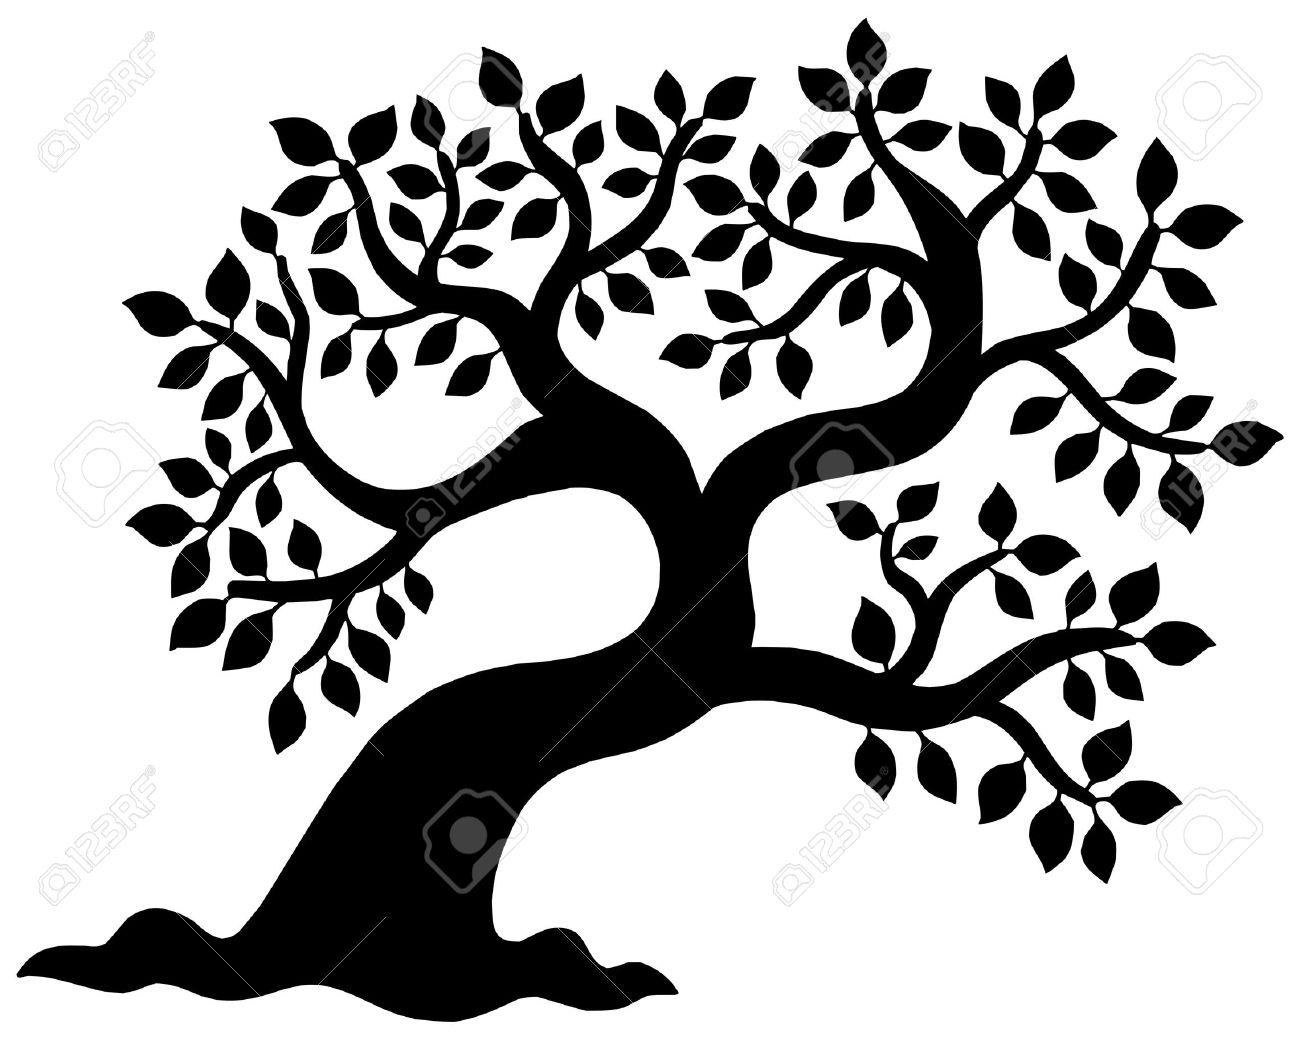 leafy tree silhouette vector illustration royalty free cliparts rh 123rf com tree silhouette vector free tree silhouette vector download